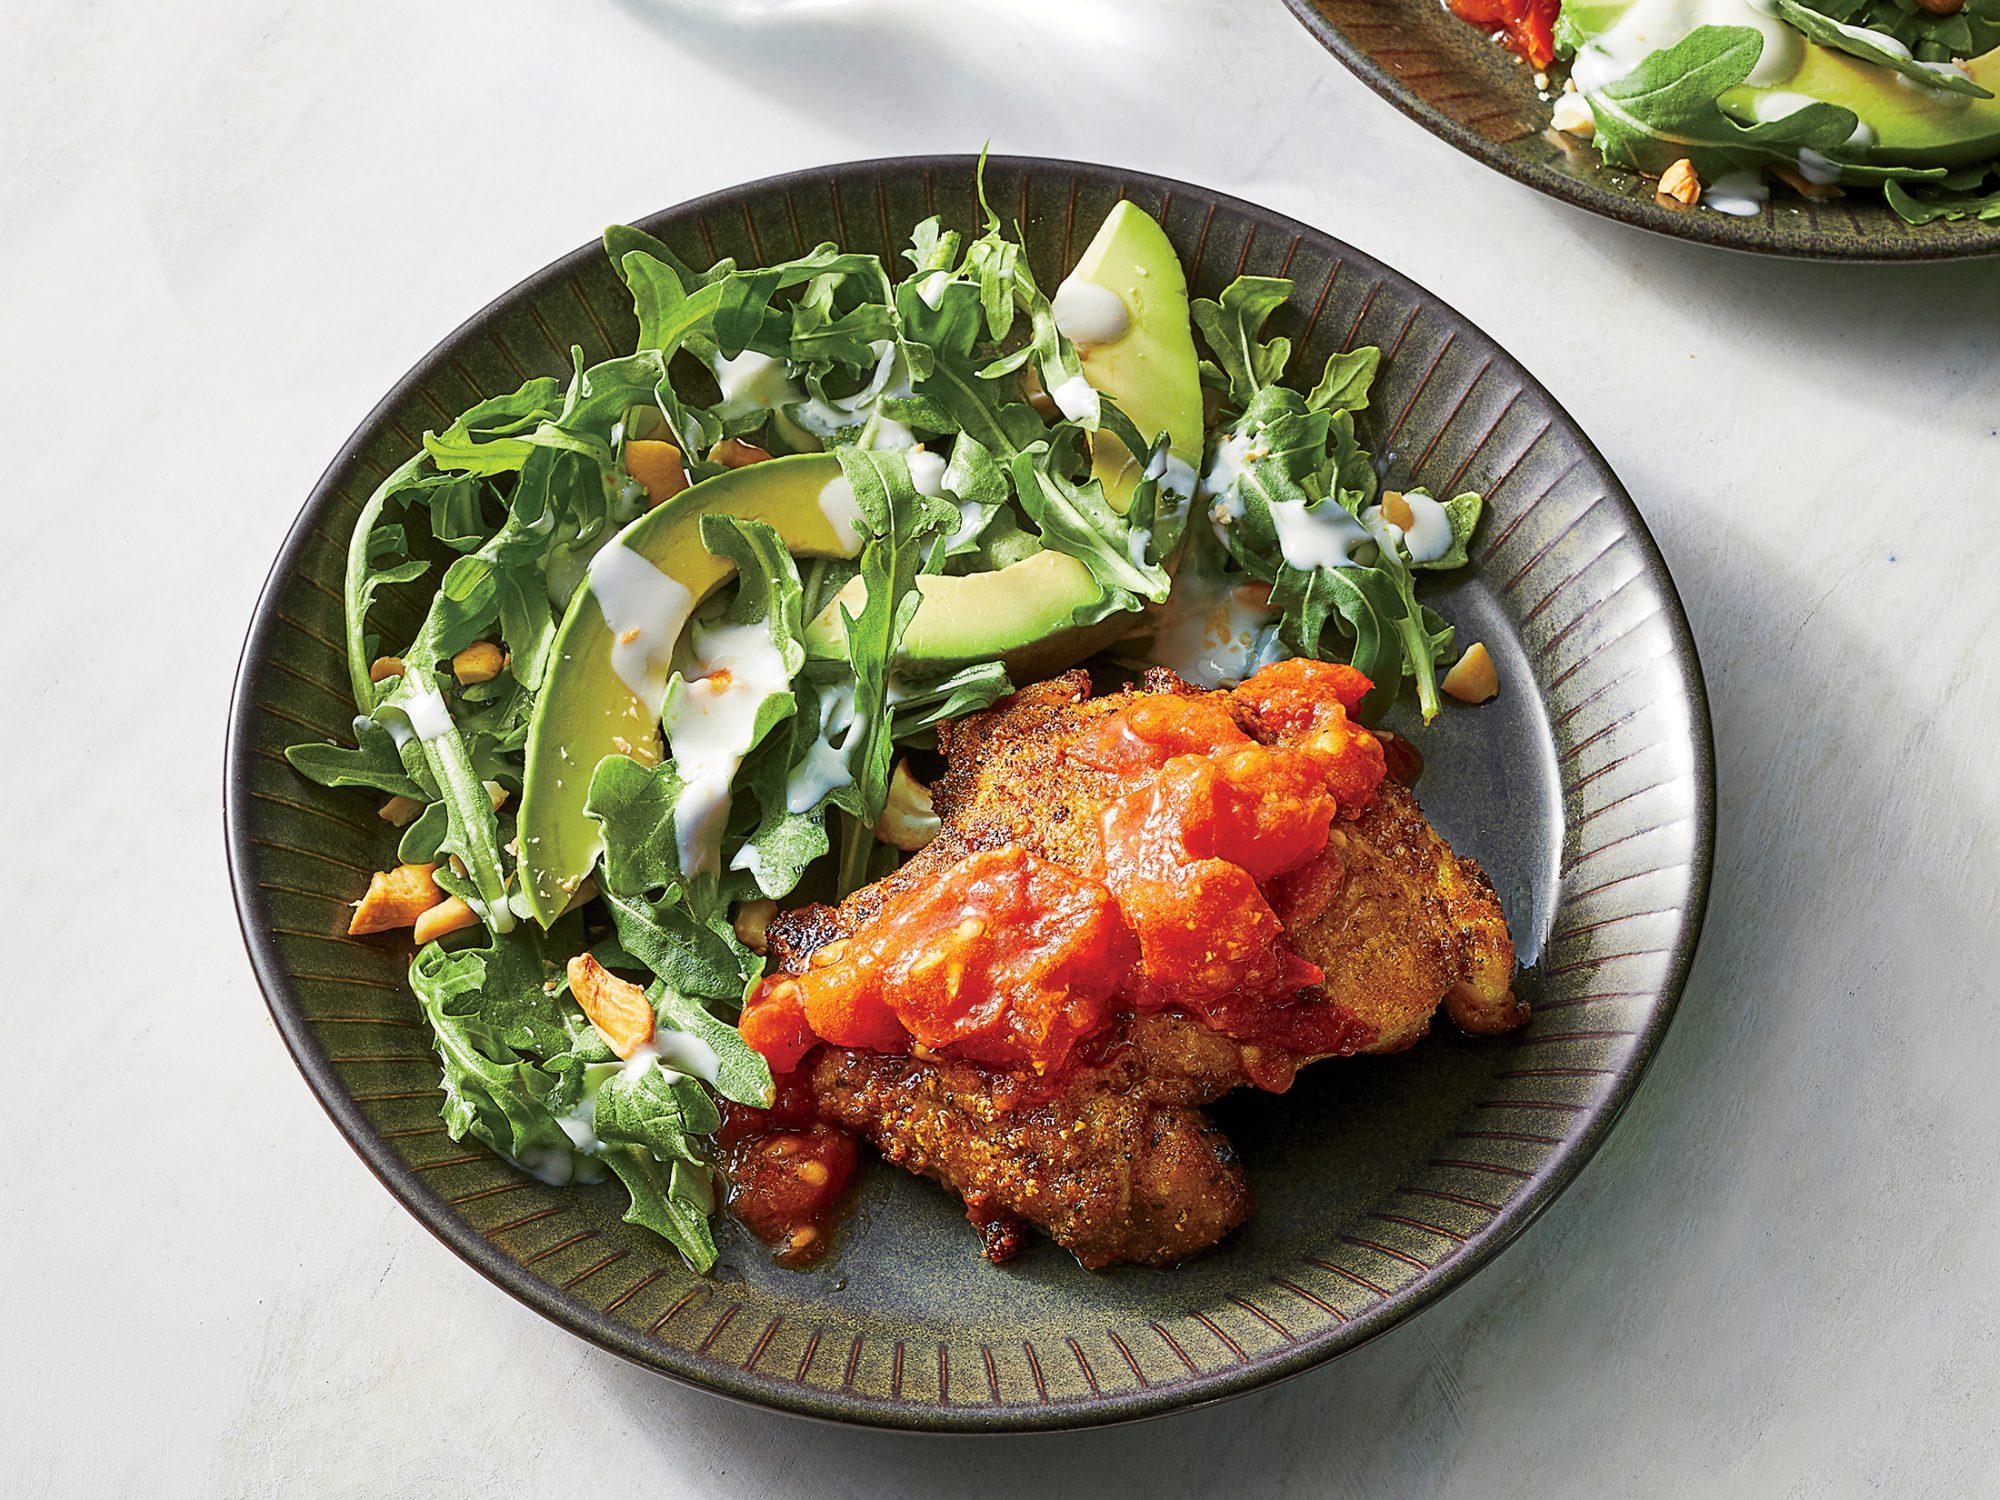 Crispy Curry Chicken with Avocado Salad